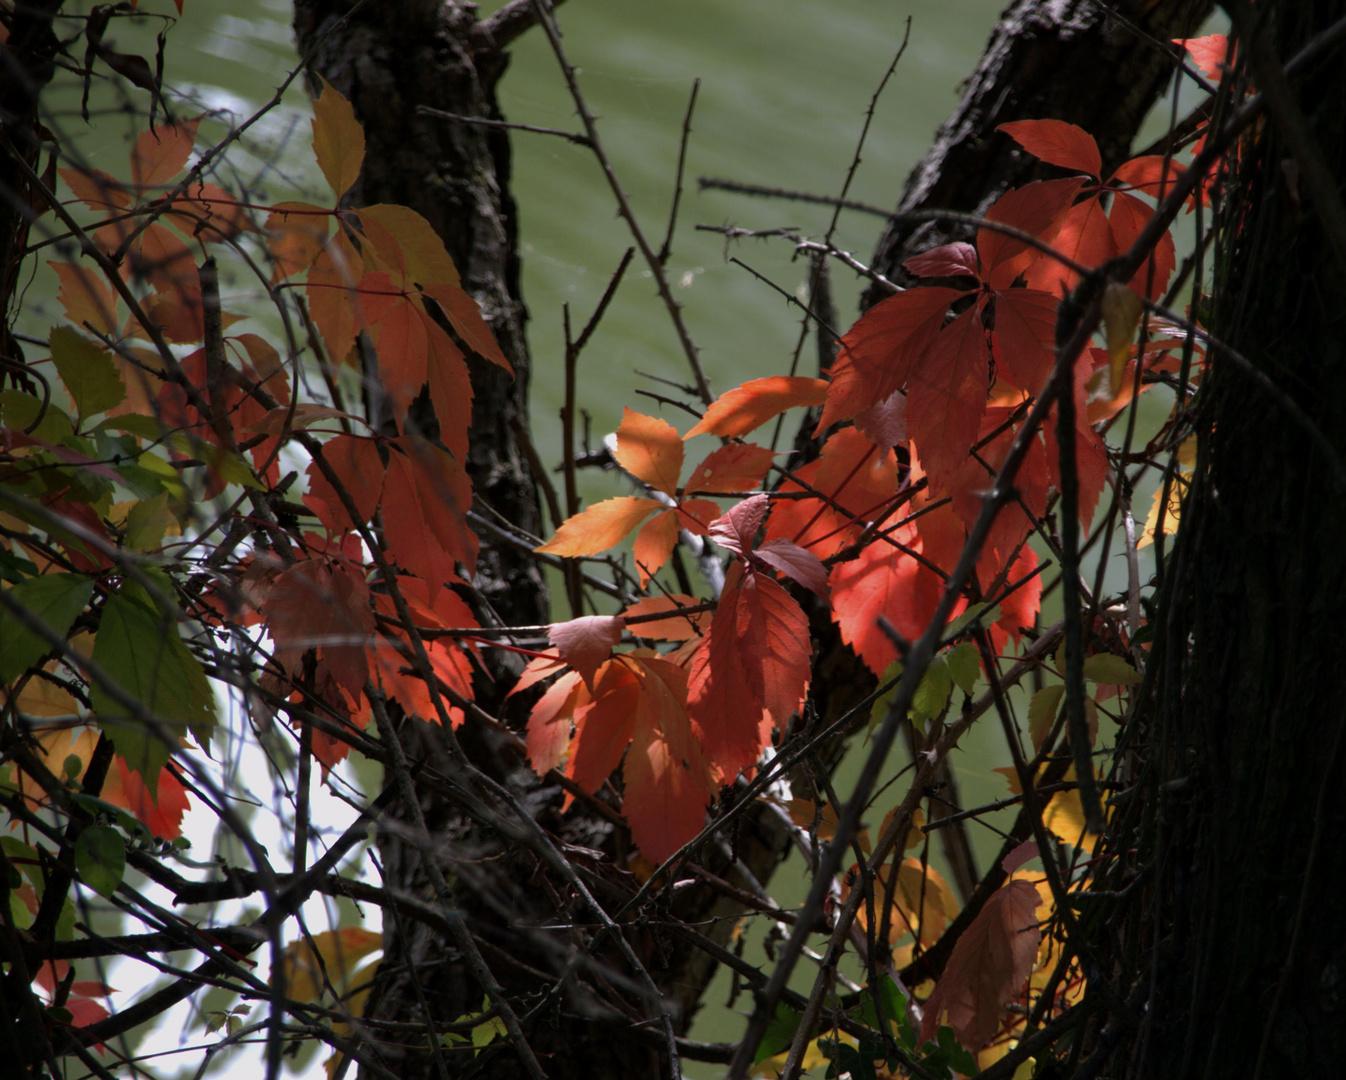 Un berceau de feuilles